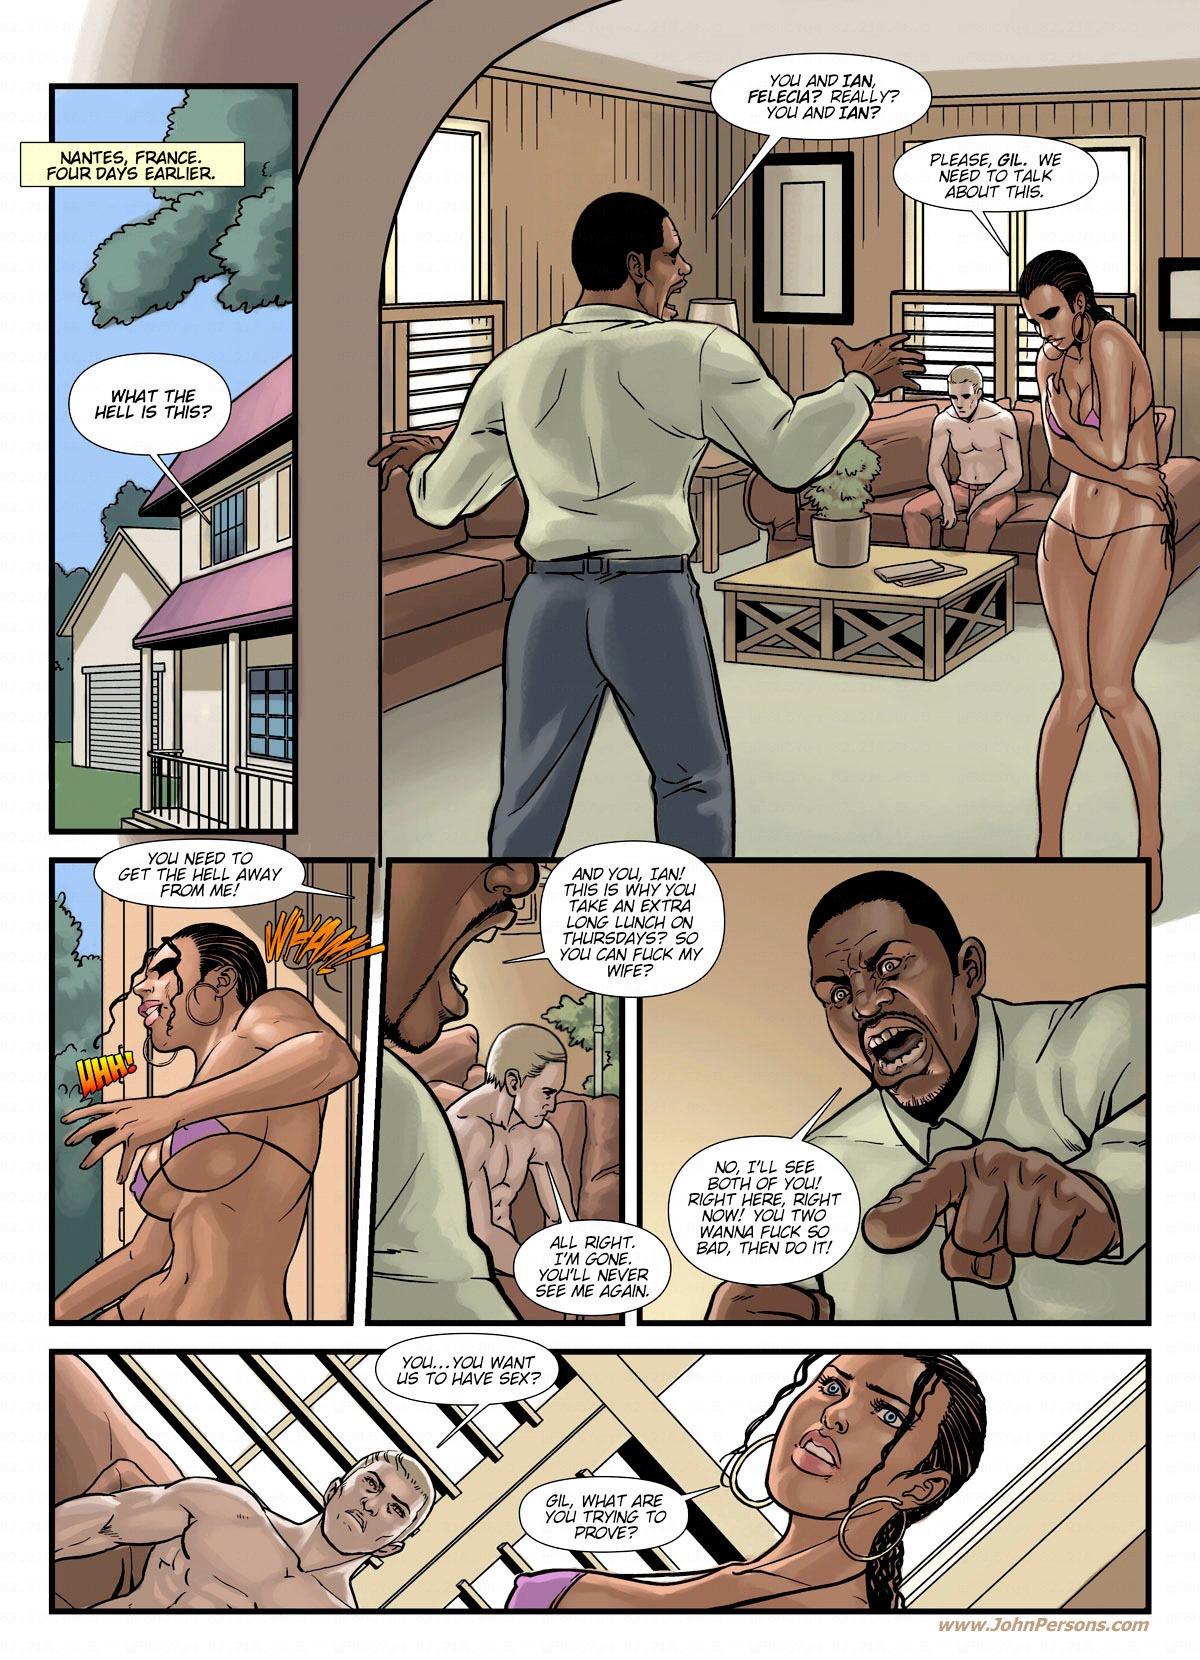 leann rimes nude sex